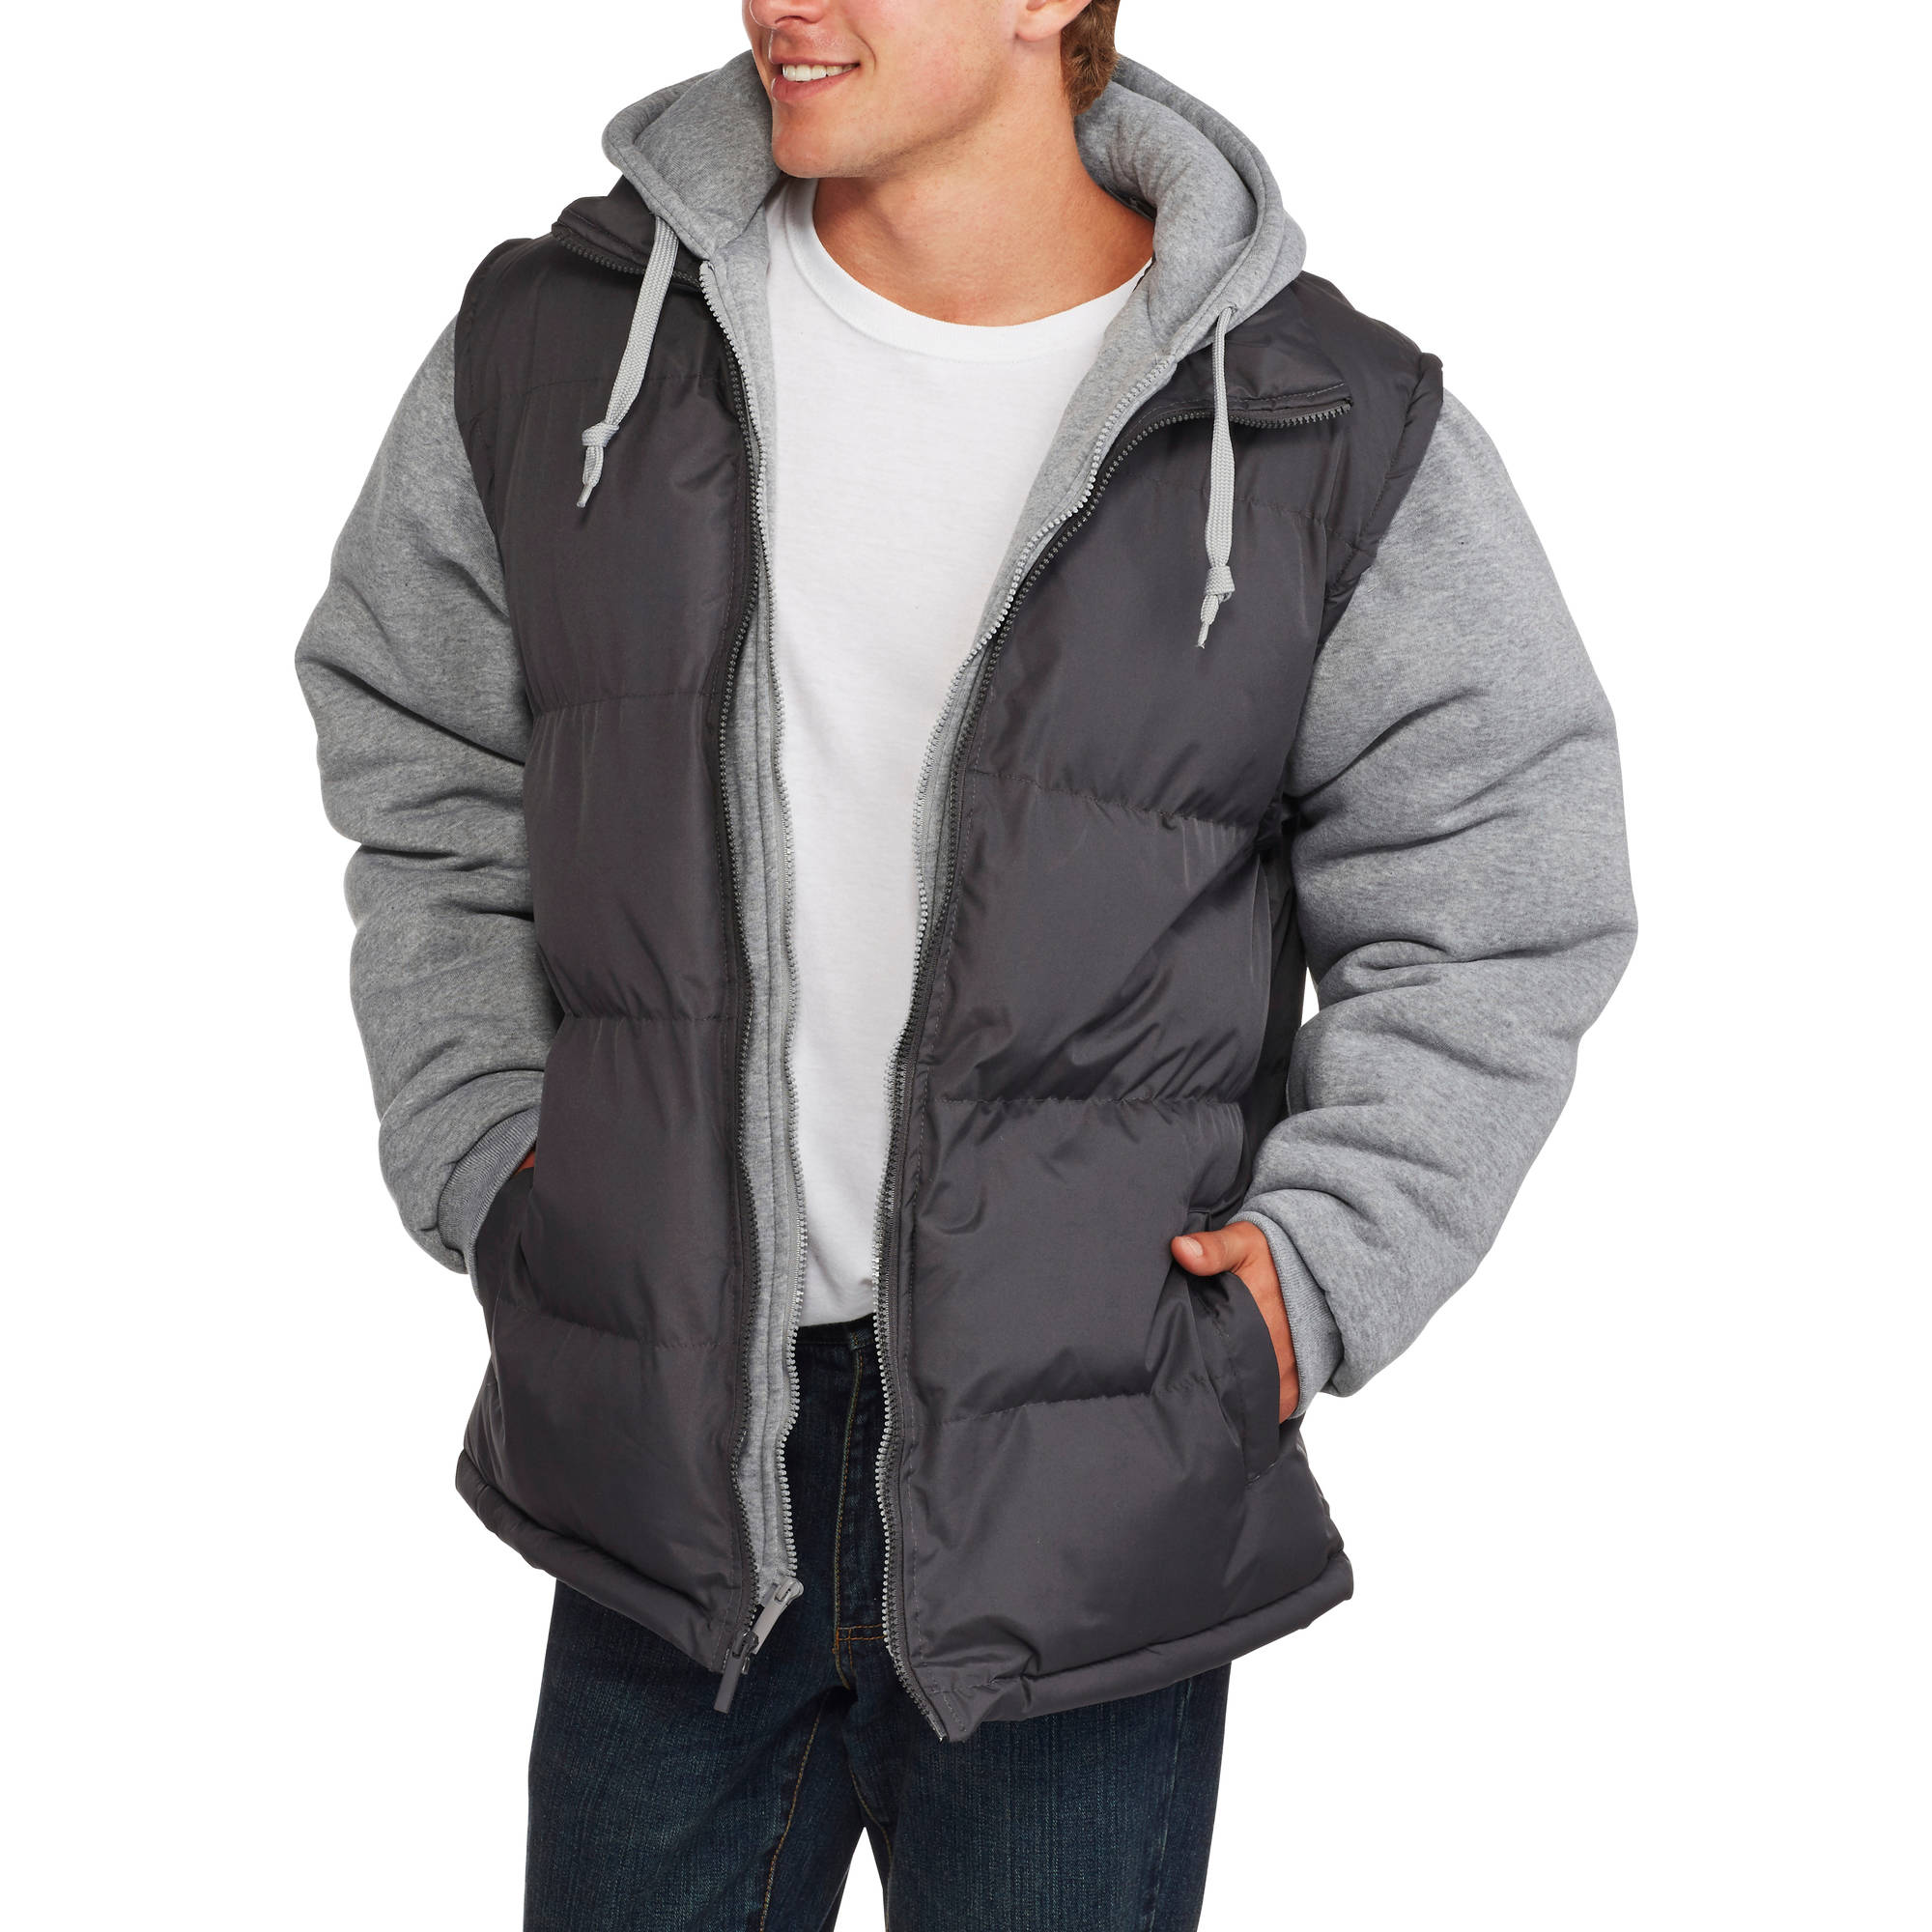 Men's Bubble Jacket with Fleece Chest Warmer and Fleece Sleeves